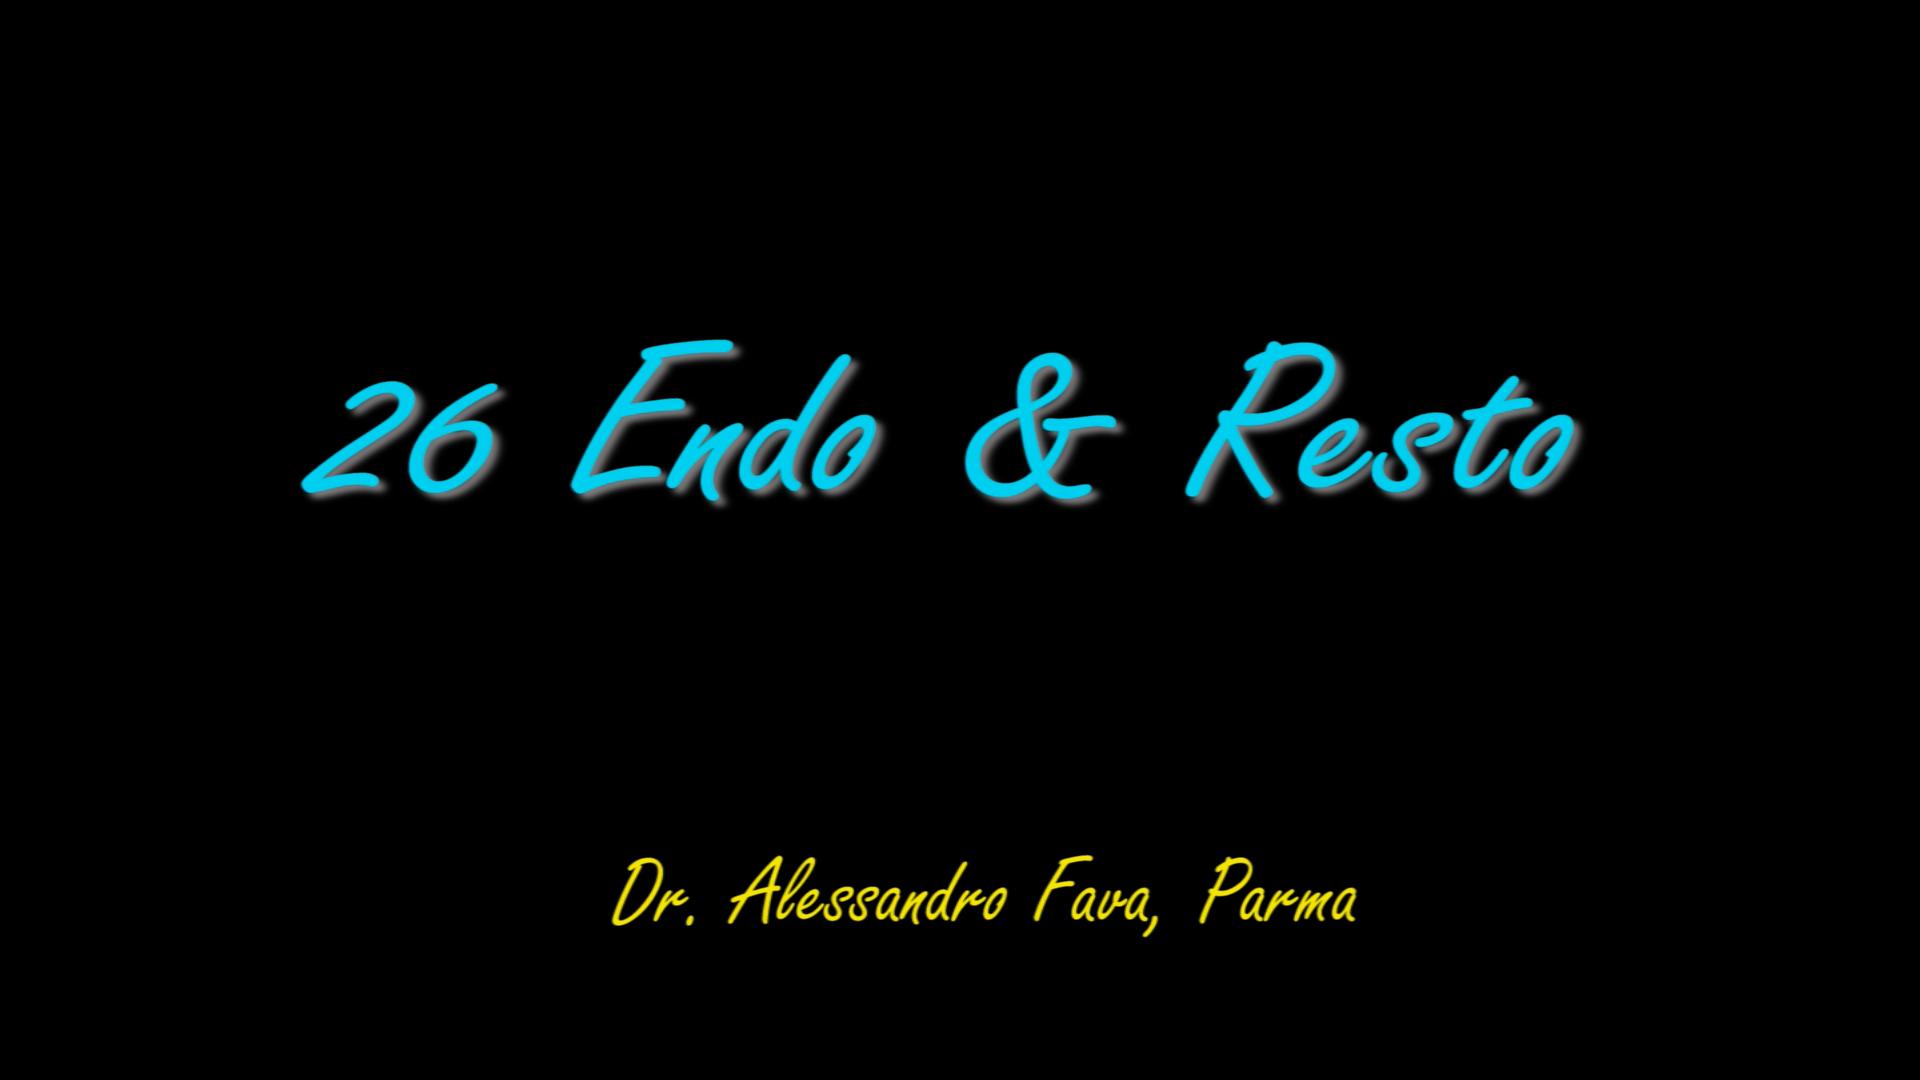 Endo & Resto n.26 by Alessandro Fava (27)